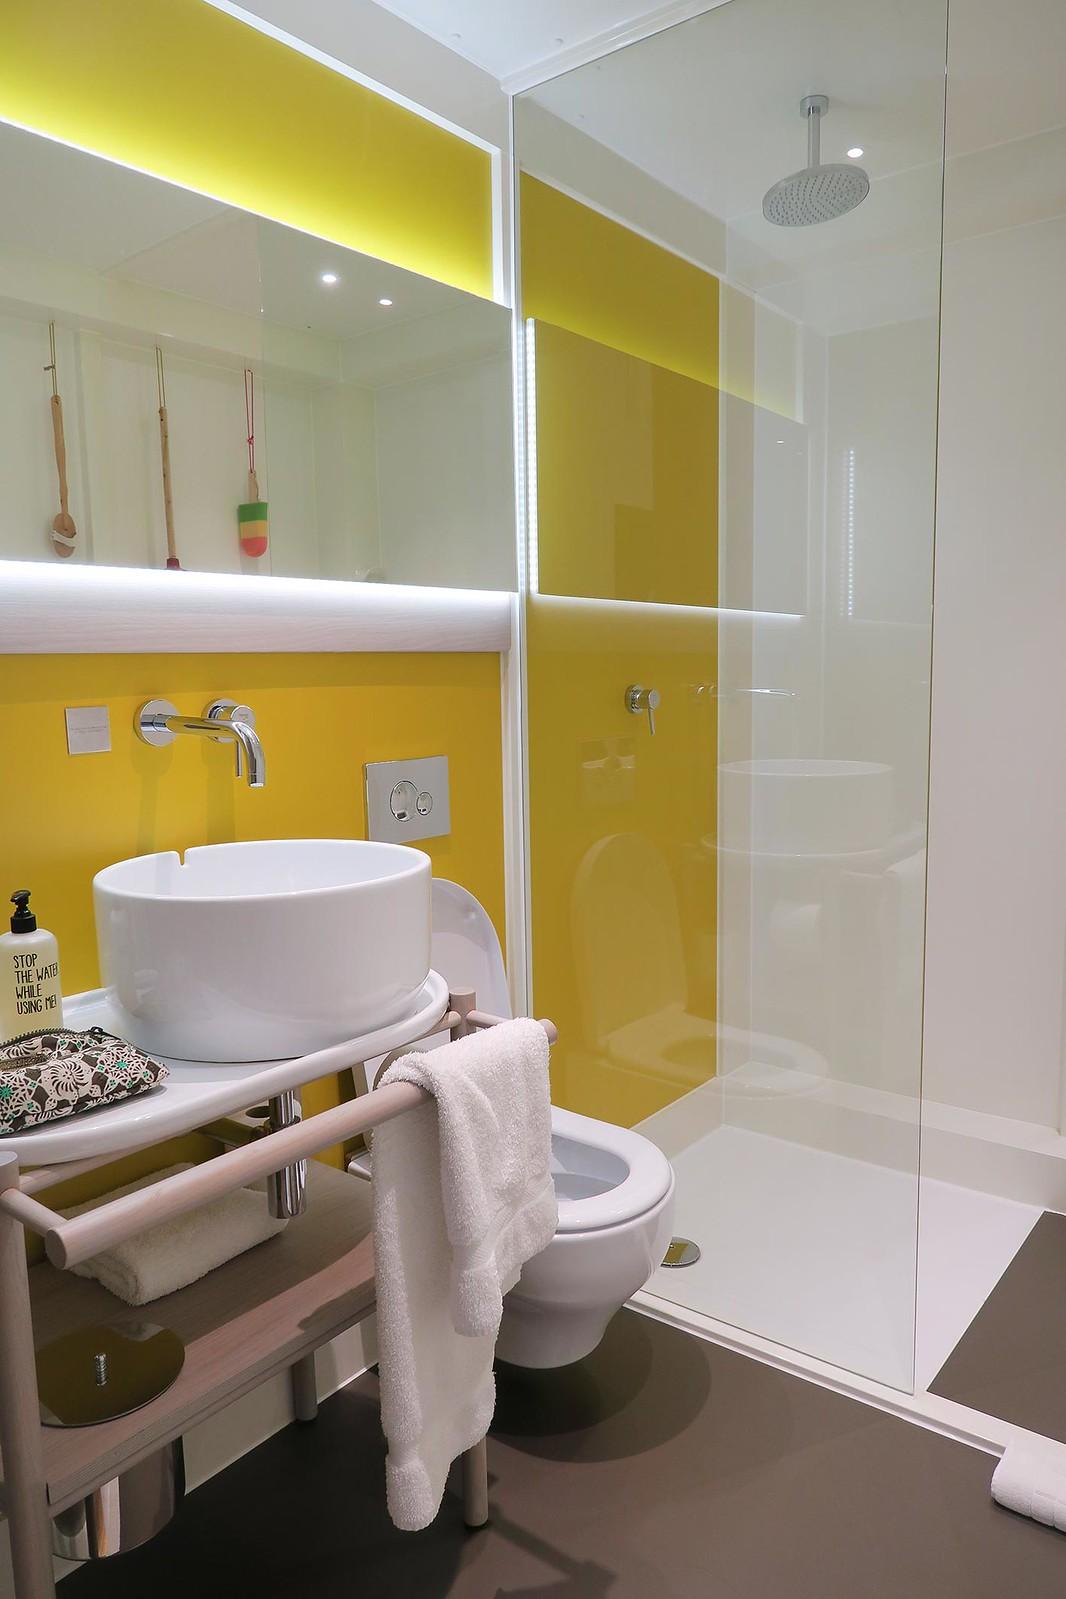 qbic-hotel-london-rainfall-shower-large-bathroom